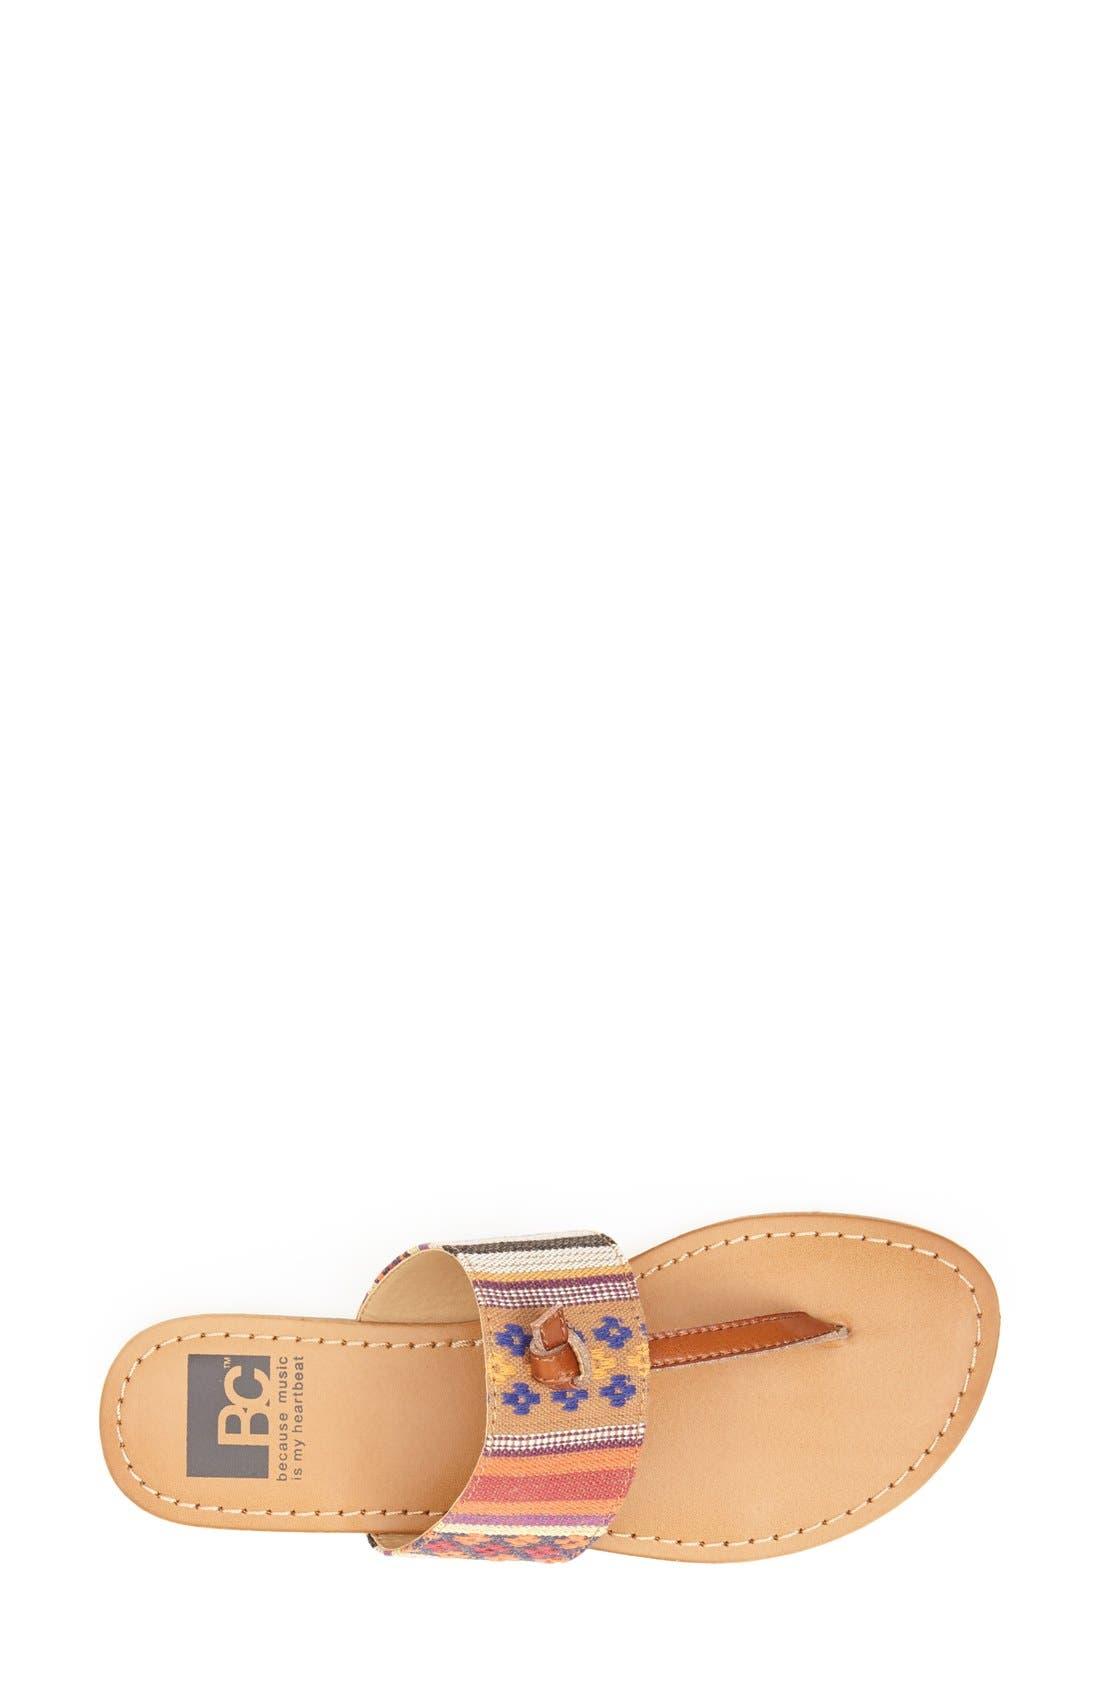 Alternate Image 3  - BC Footwear 'Gotta Try' Thong Sandal (Women)